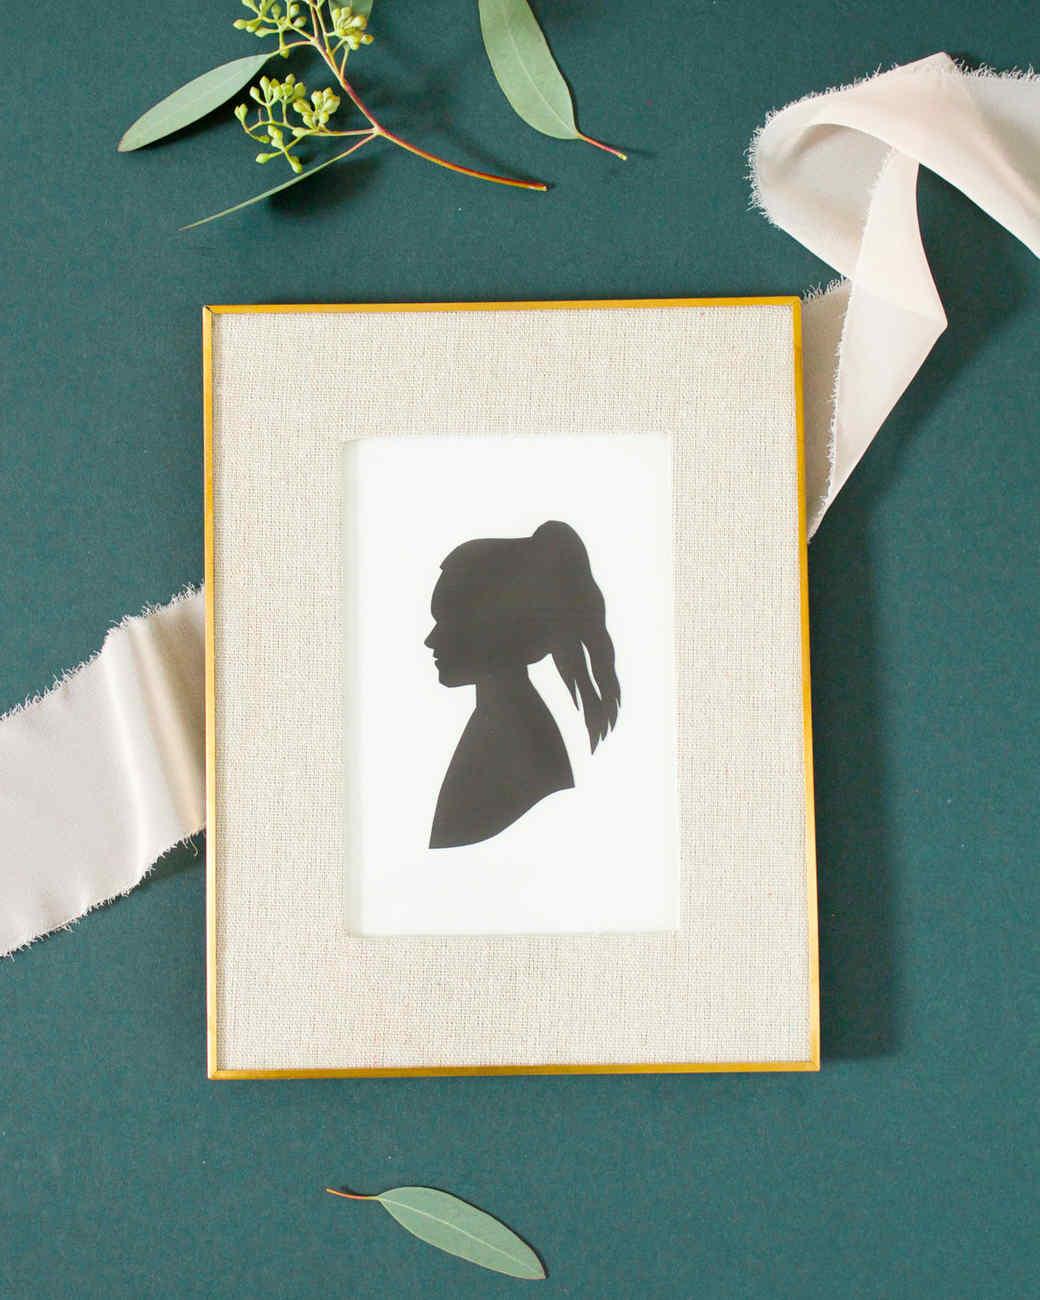 framed silhouette art profile of woman